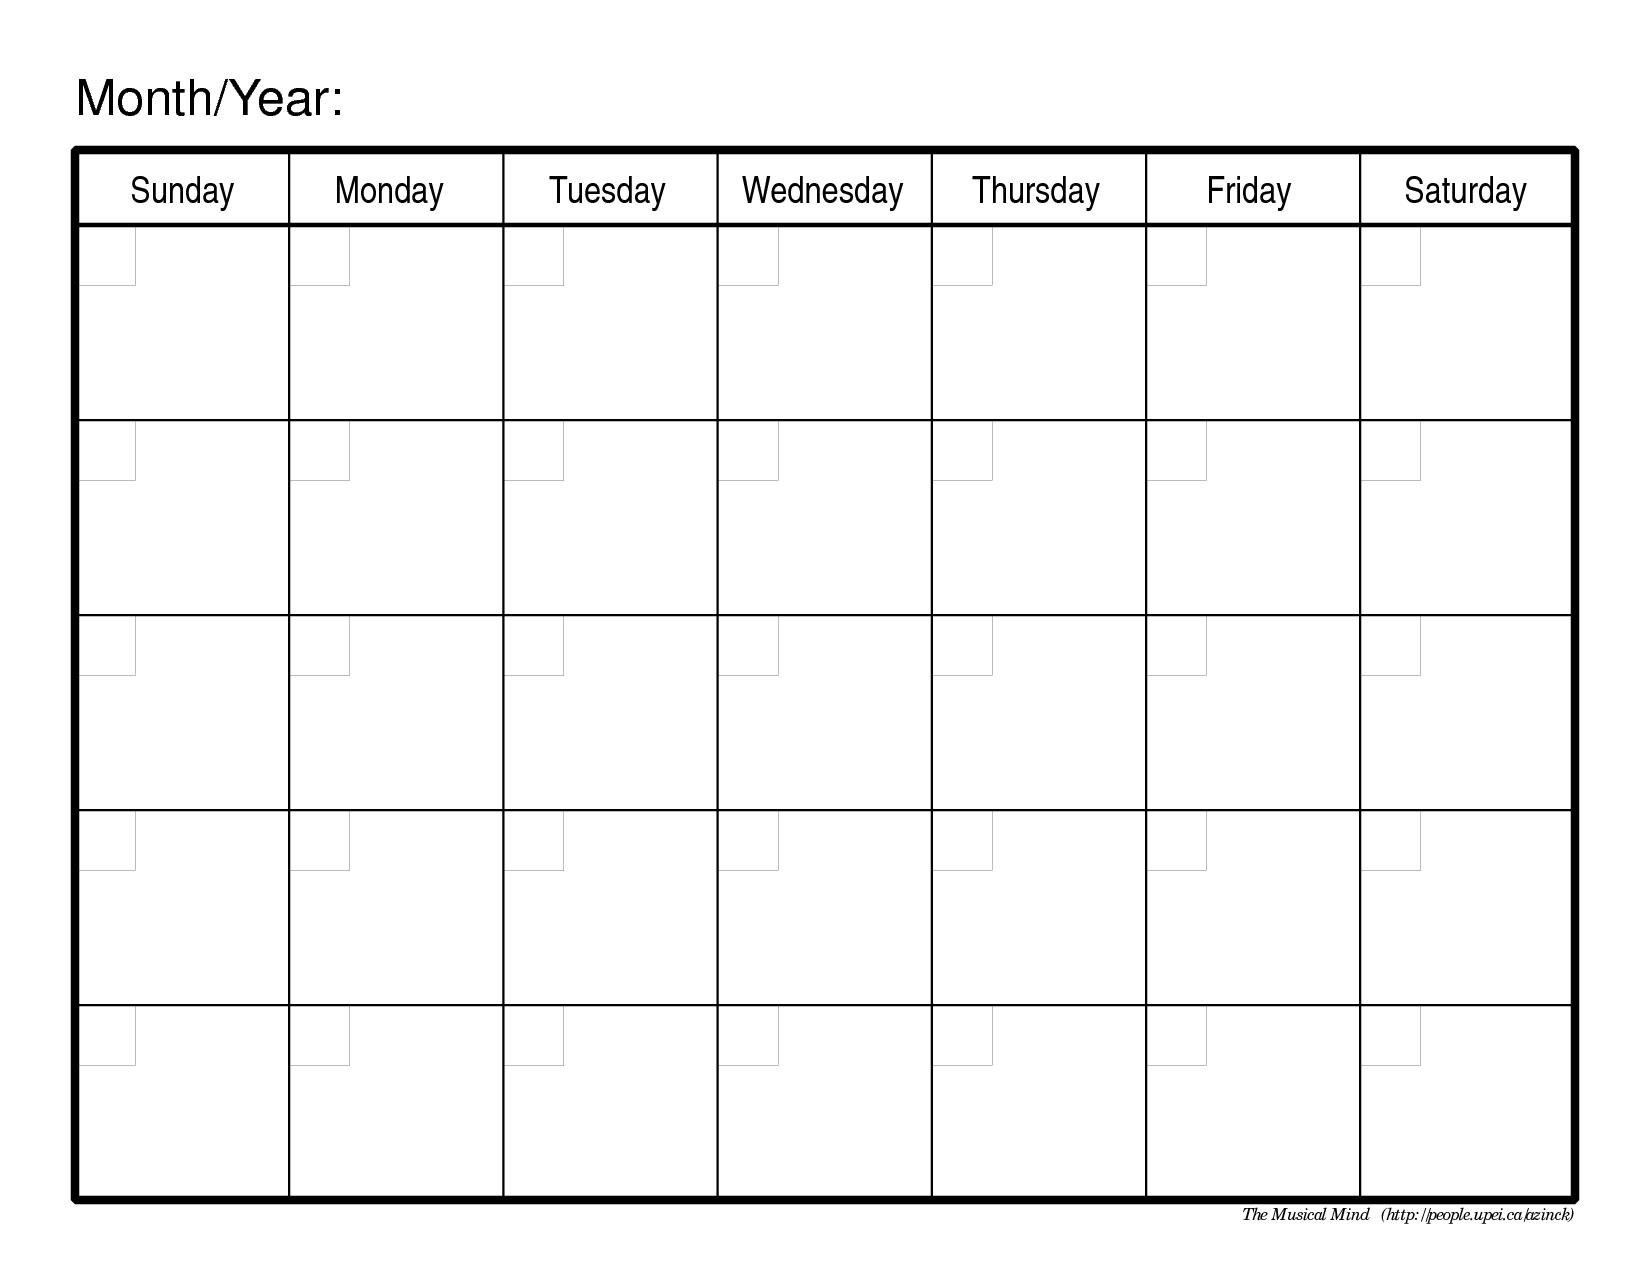 Printable Calendar Hd Wallpapers Download Free Printable-Fre Printable Blank Calander Monthly Pages